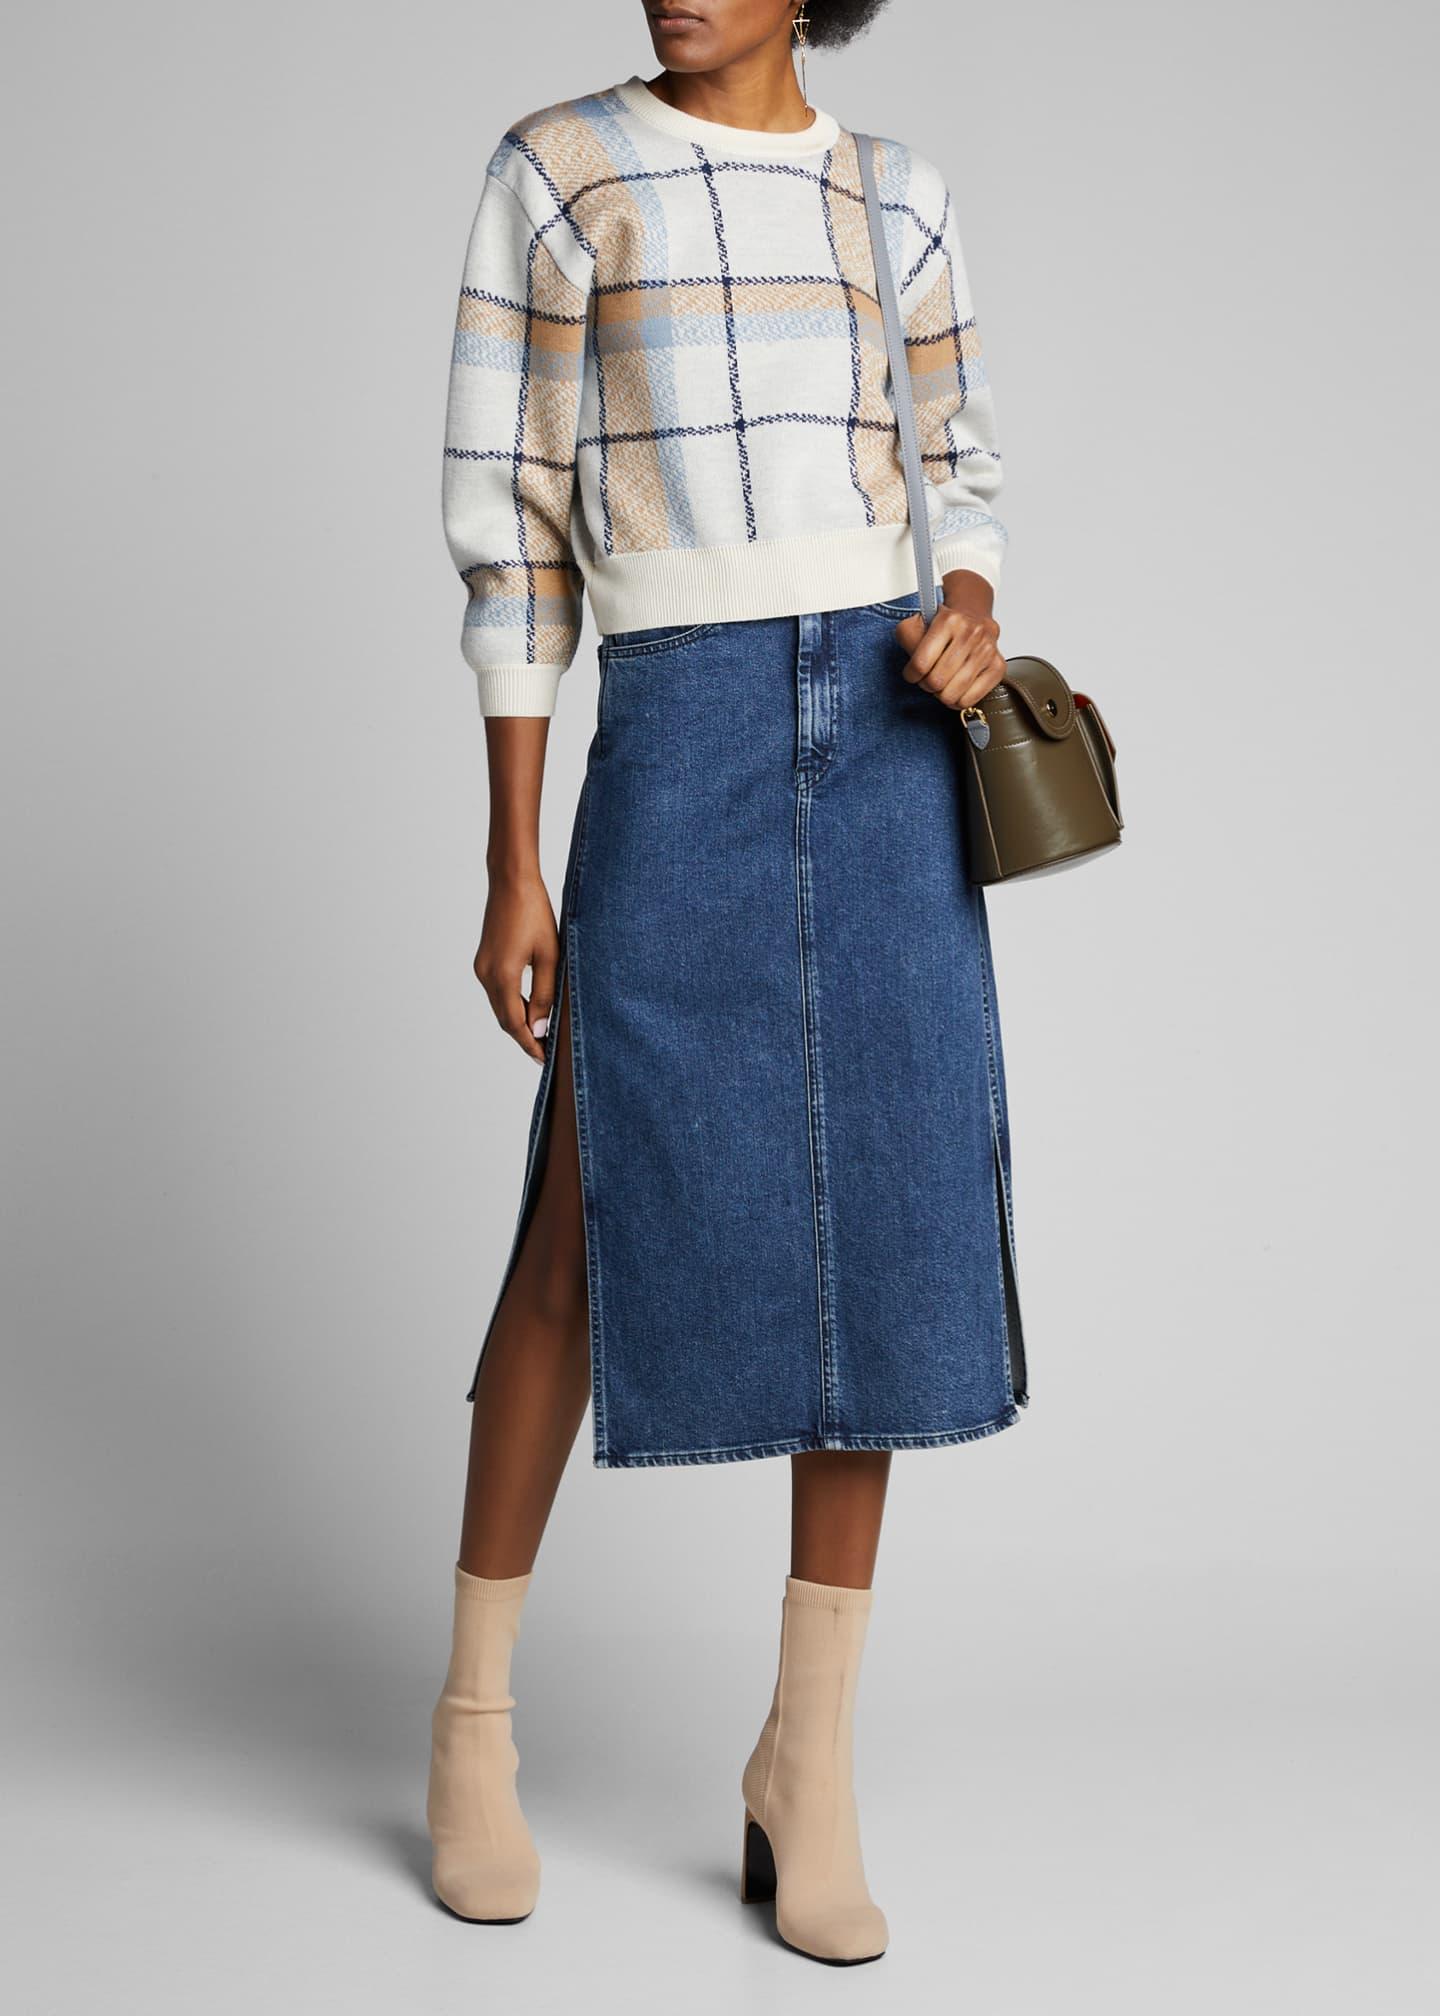 3x1 Cami Side-Split Denim Skirt